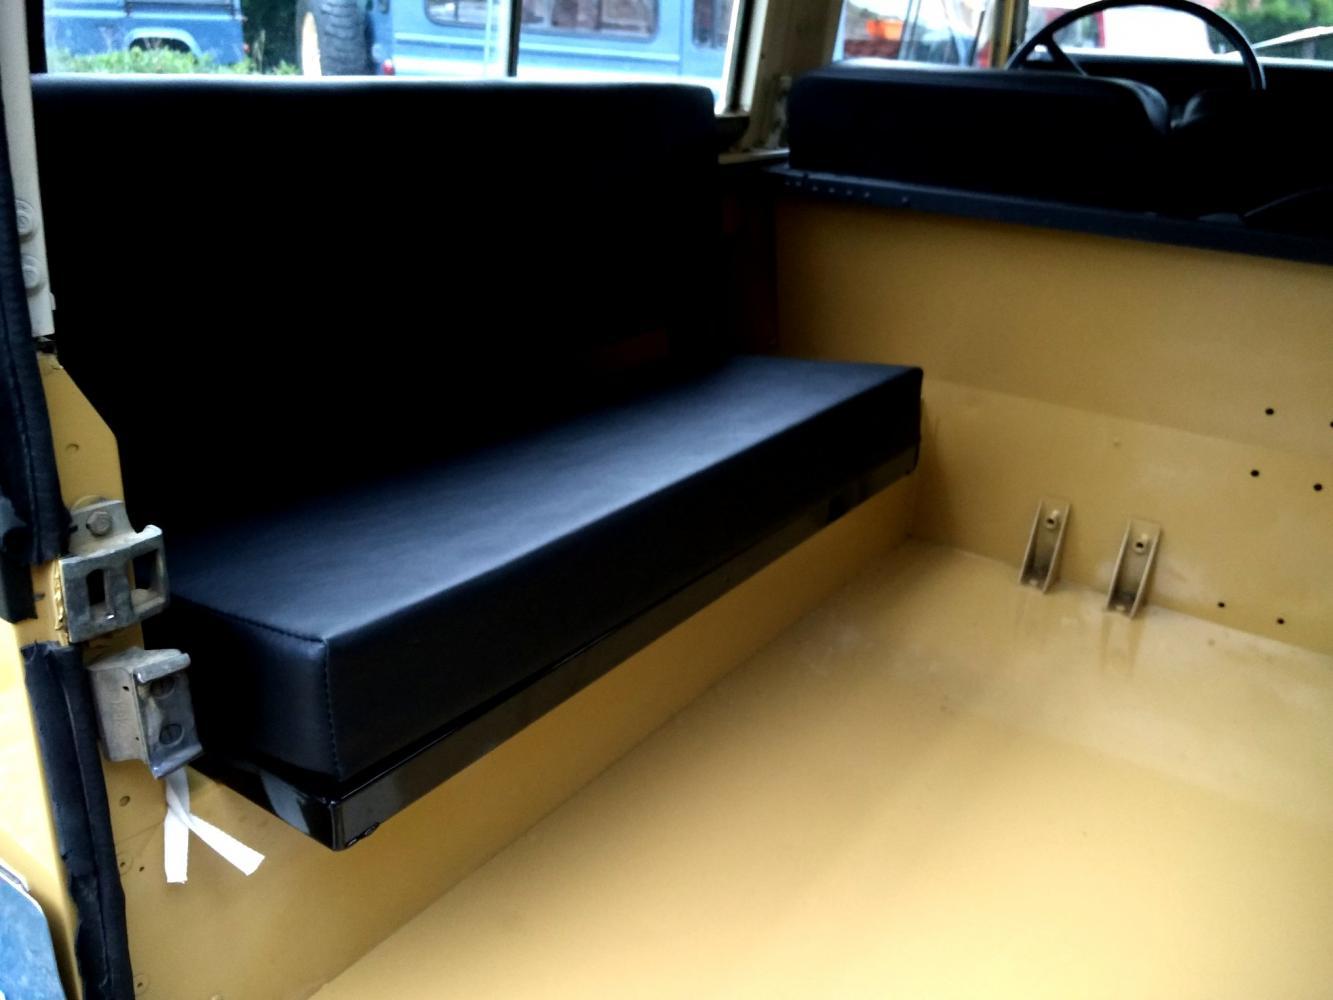 Click image for larger version  Name:1978 LR LHD Santana 88 Hardtop A Mustard Yellow loadfloor bench seat left.jpg Views:142 Size:81.7 KB ID:289937